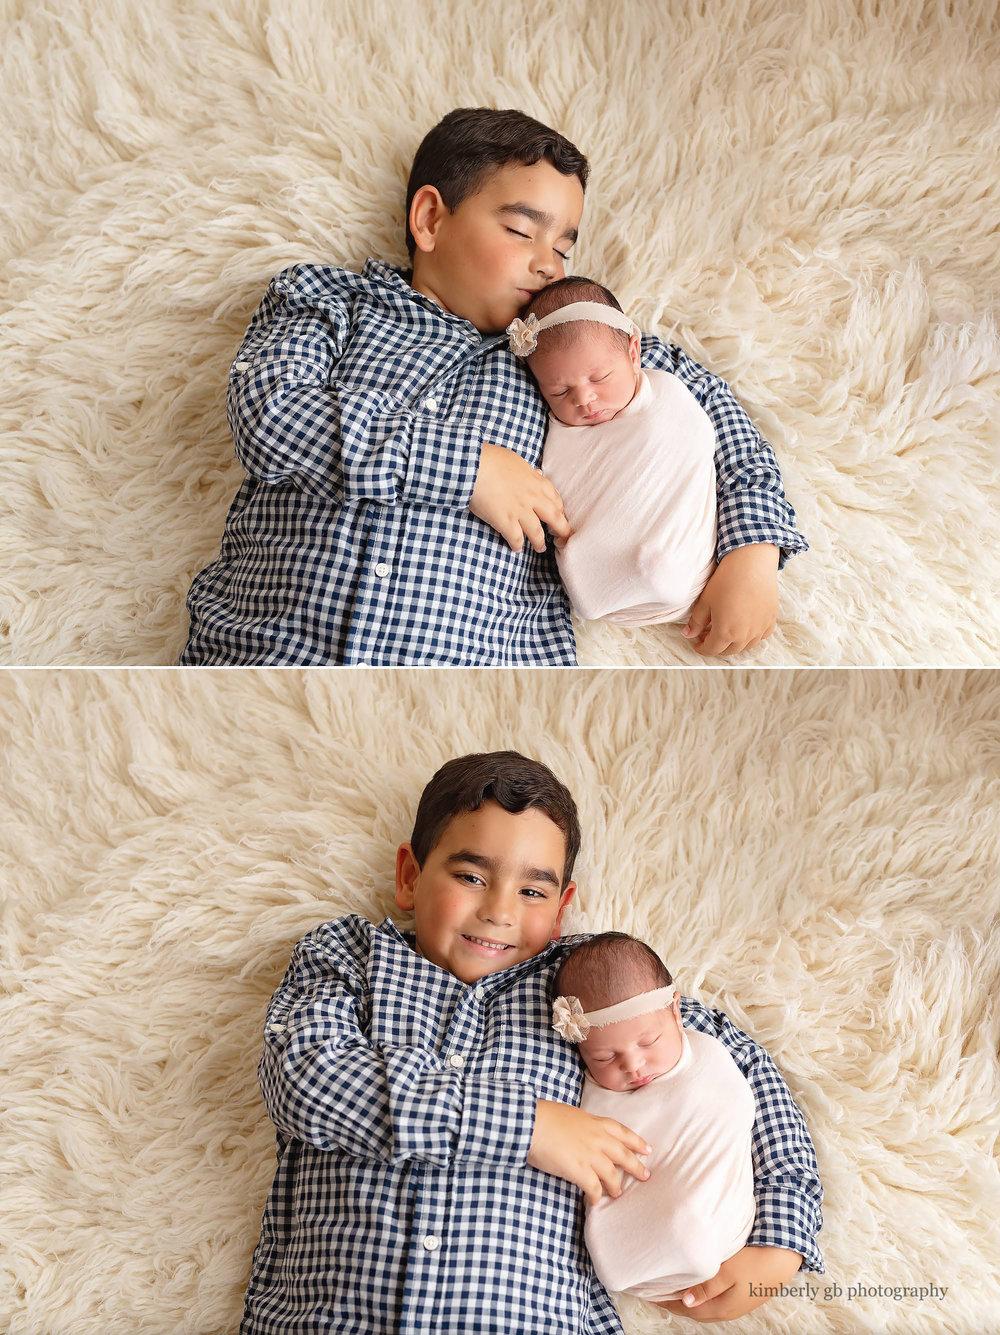 fotografia-de-recien-nacidos-bebes-newborn-en-puerto-rico-kimberly-gb-photography-fotografa-1.jpg